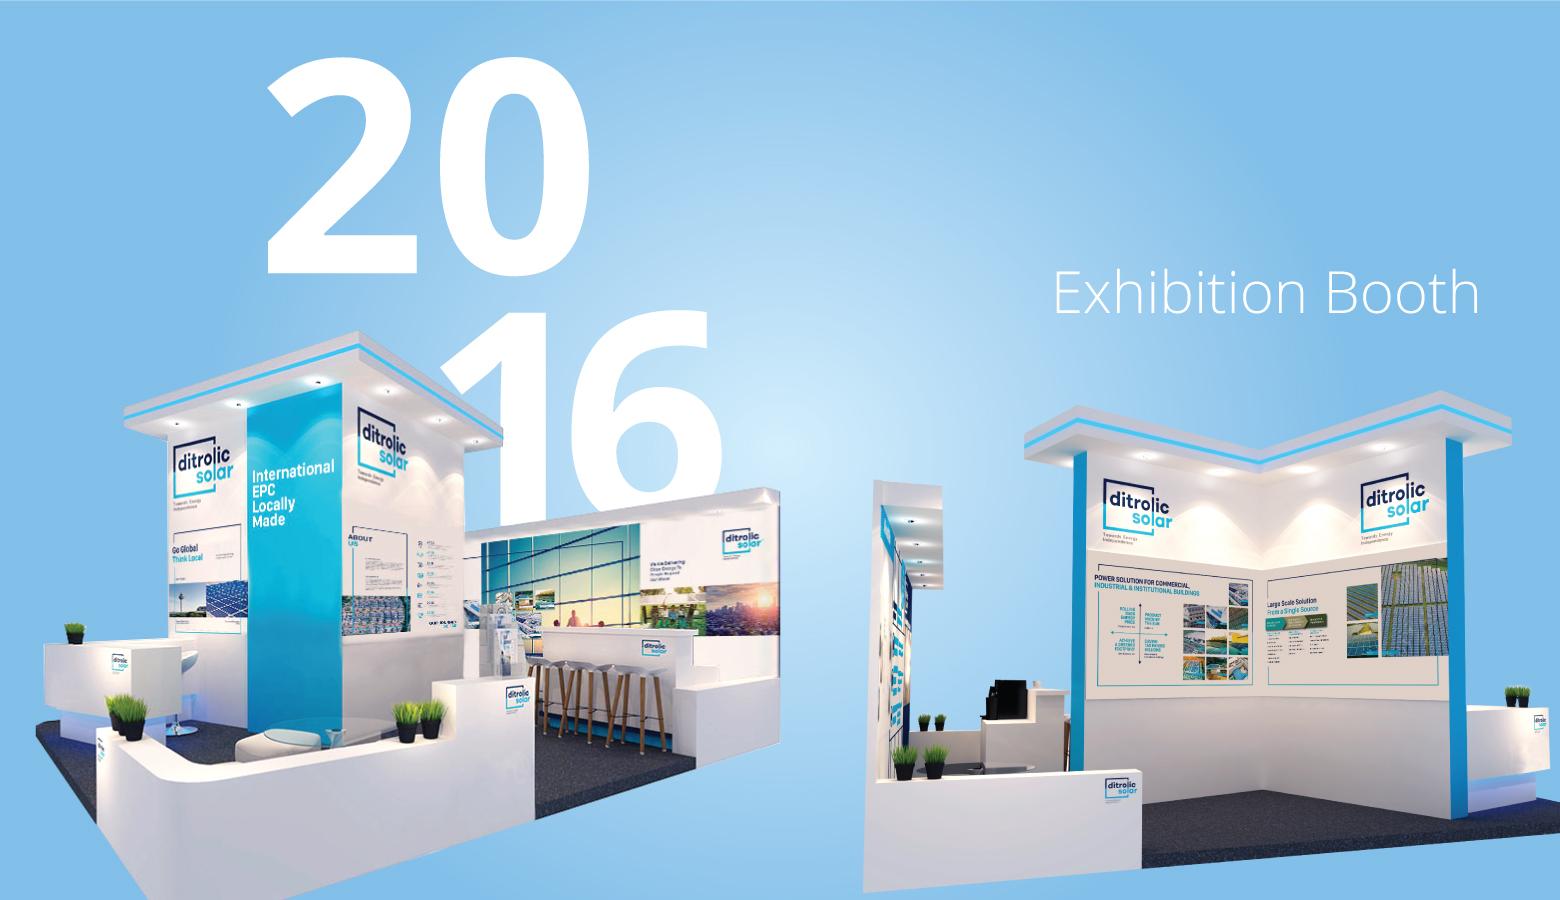 Ditrolic Solar exhibition booth